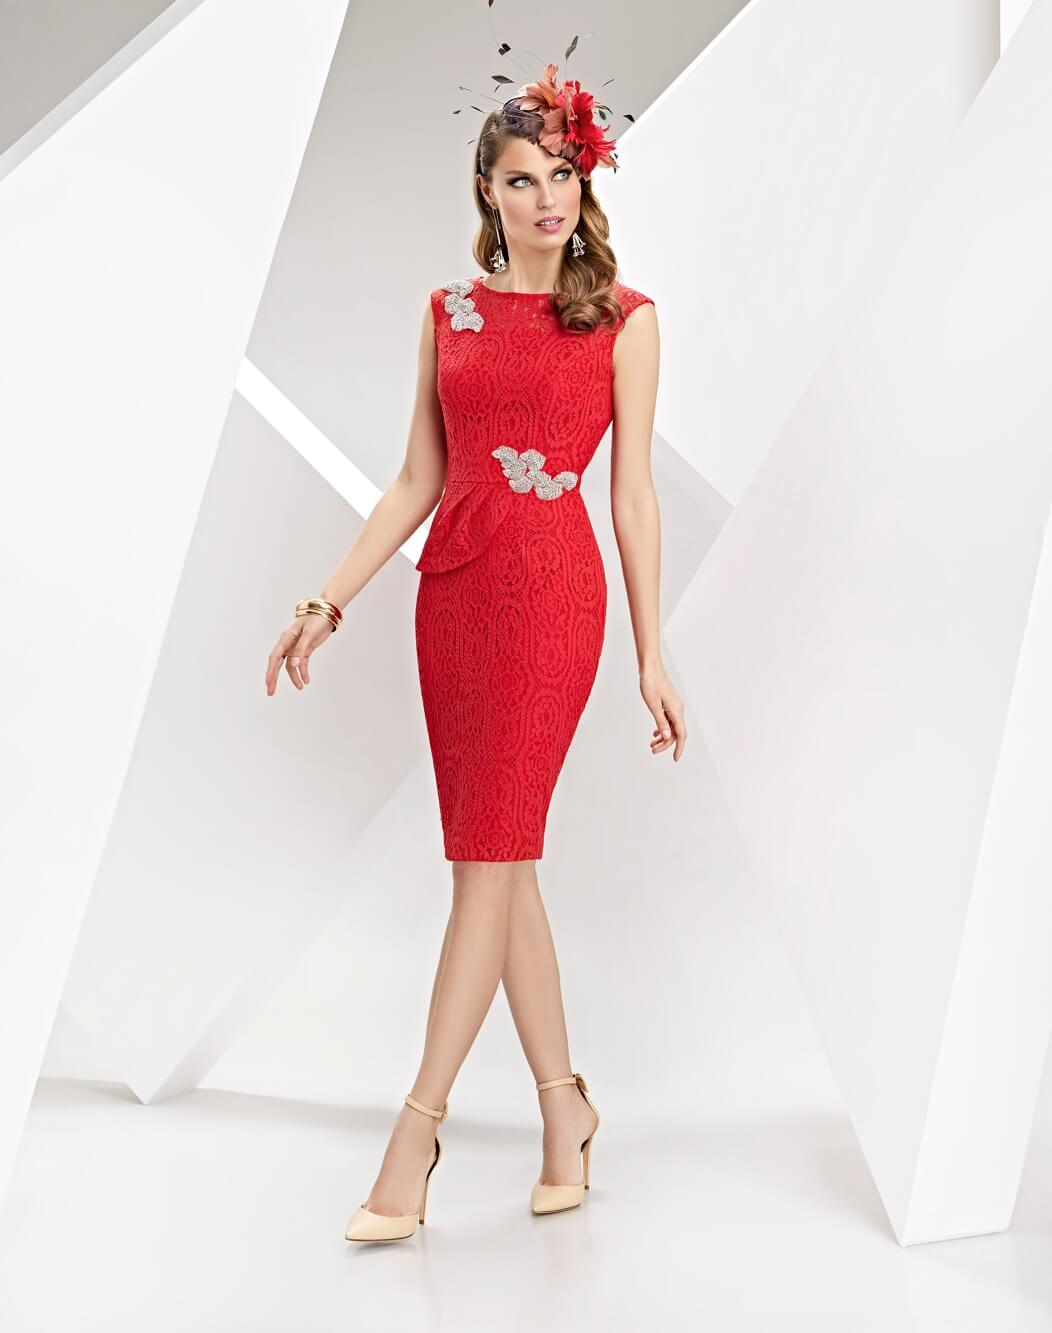 Vestido corto de encaje color rojo modelo Litios Esthefan